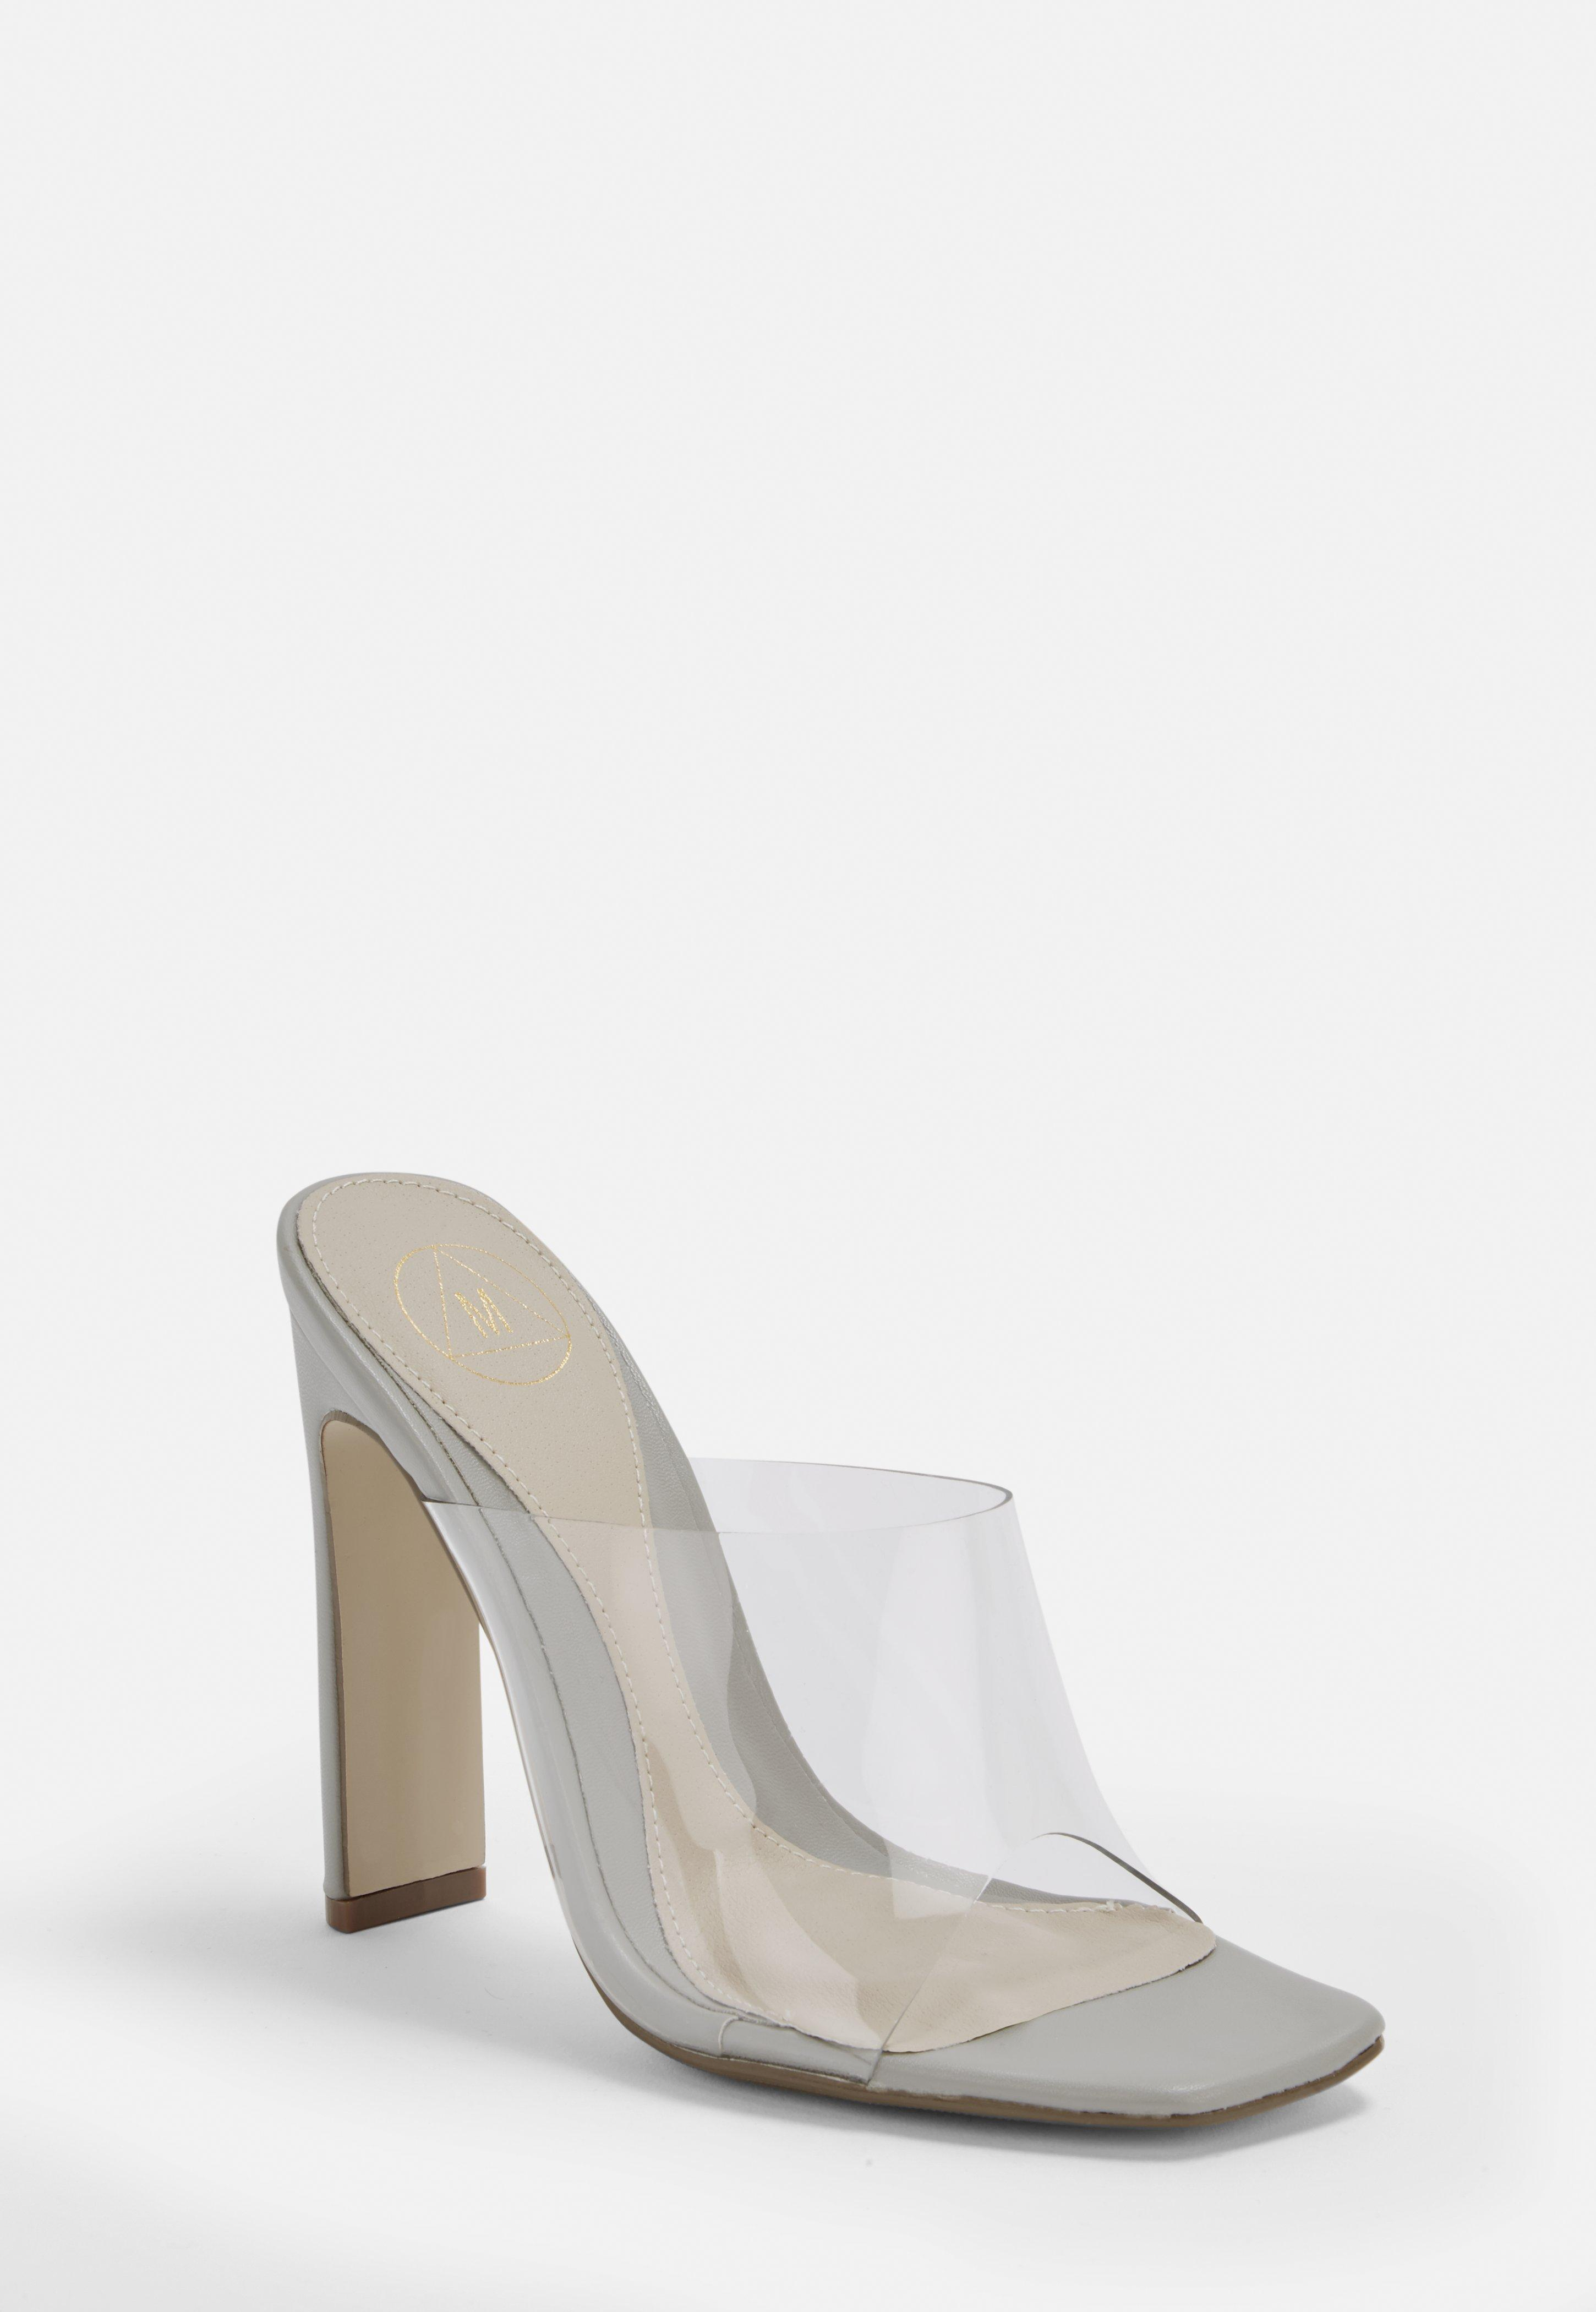 6eea990bc83574 Clear Heels - Women s Clear High Heels